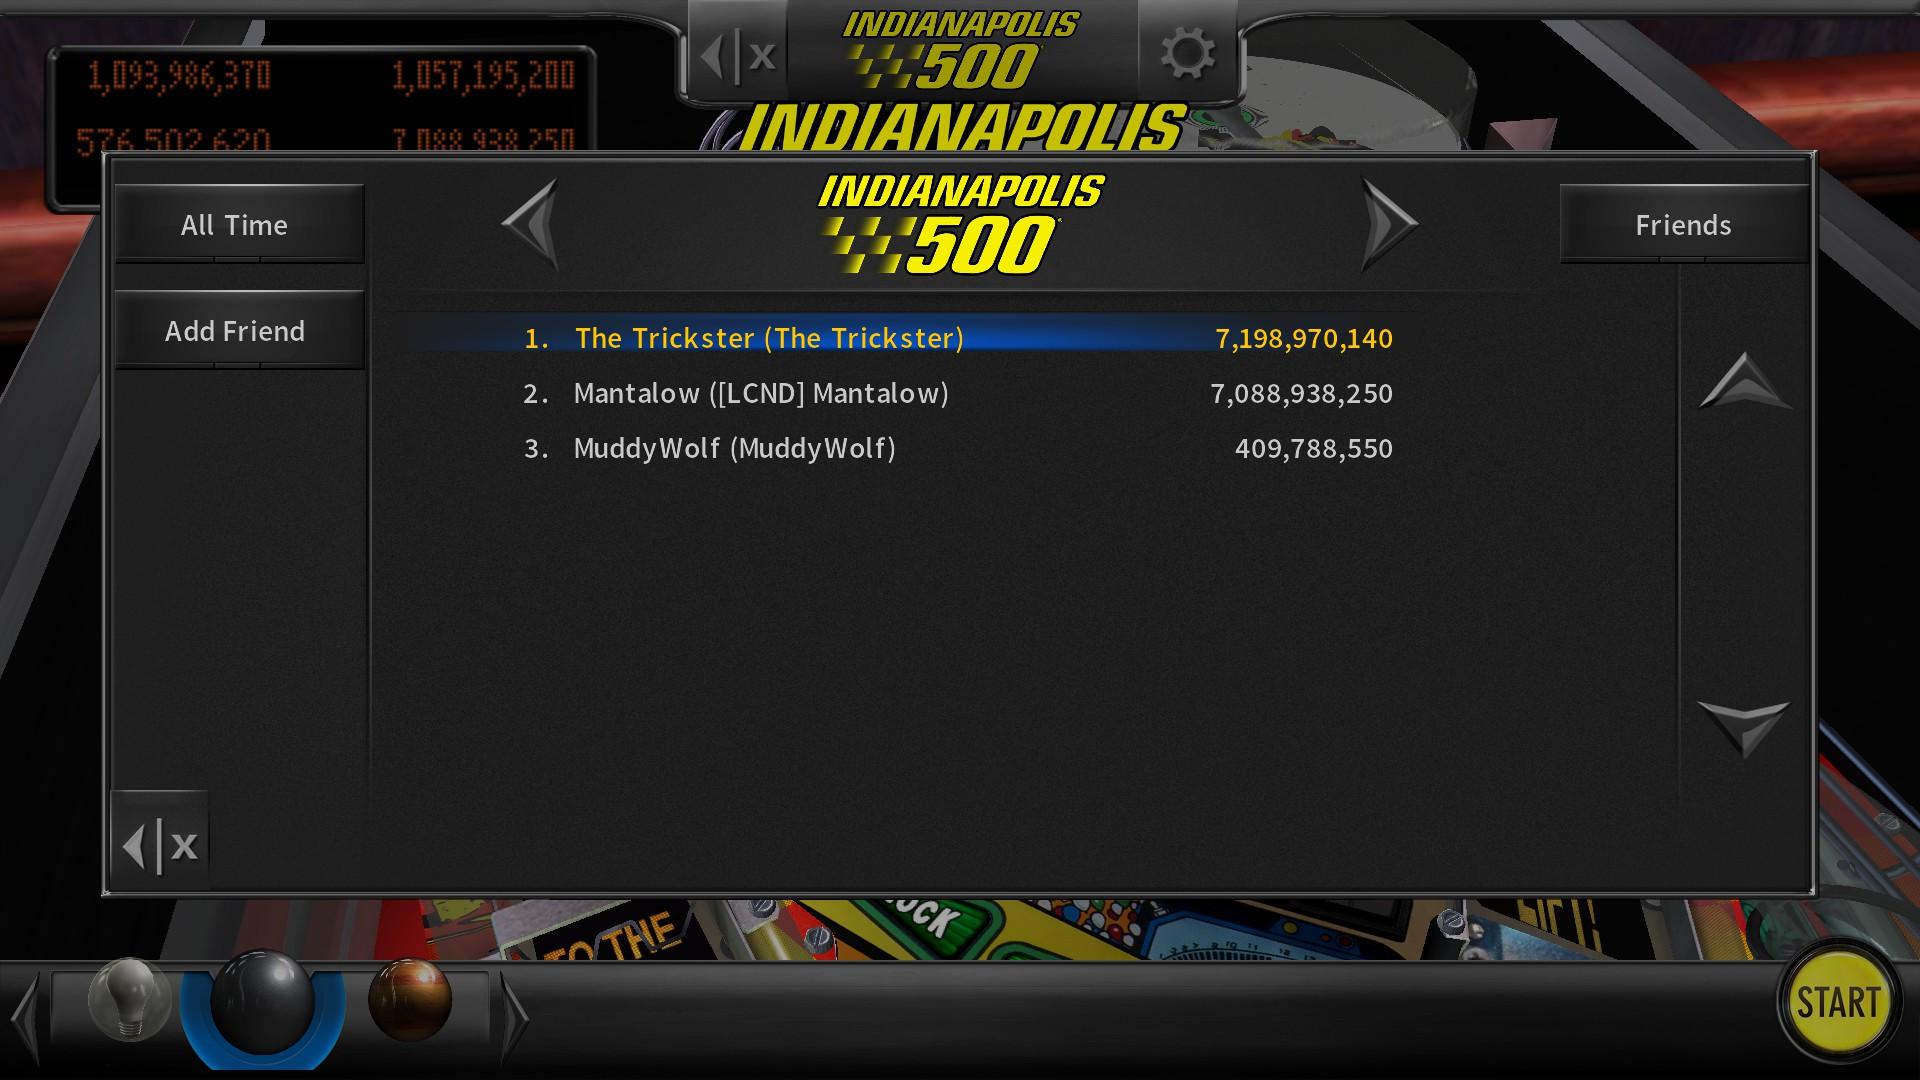 Mantalow: Pinball Arcade: Indianapolis 500 (PC) 7,088,938,250 points on 2016-08-01 06:05:57